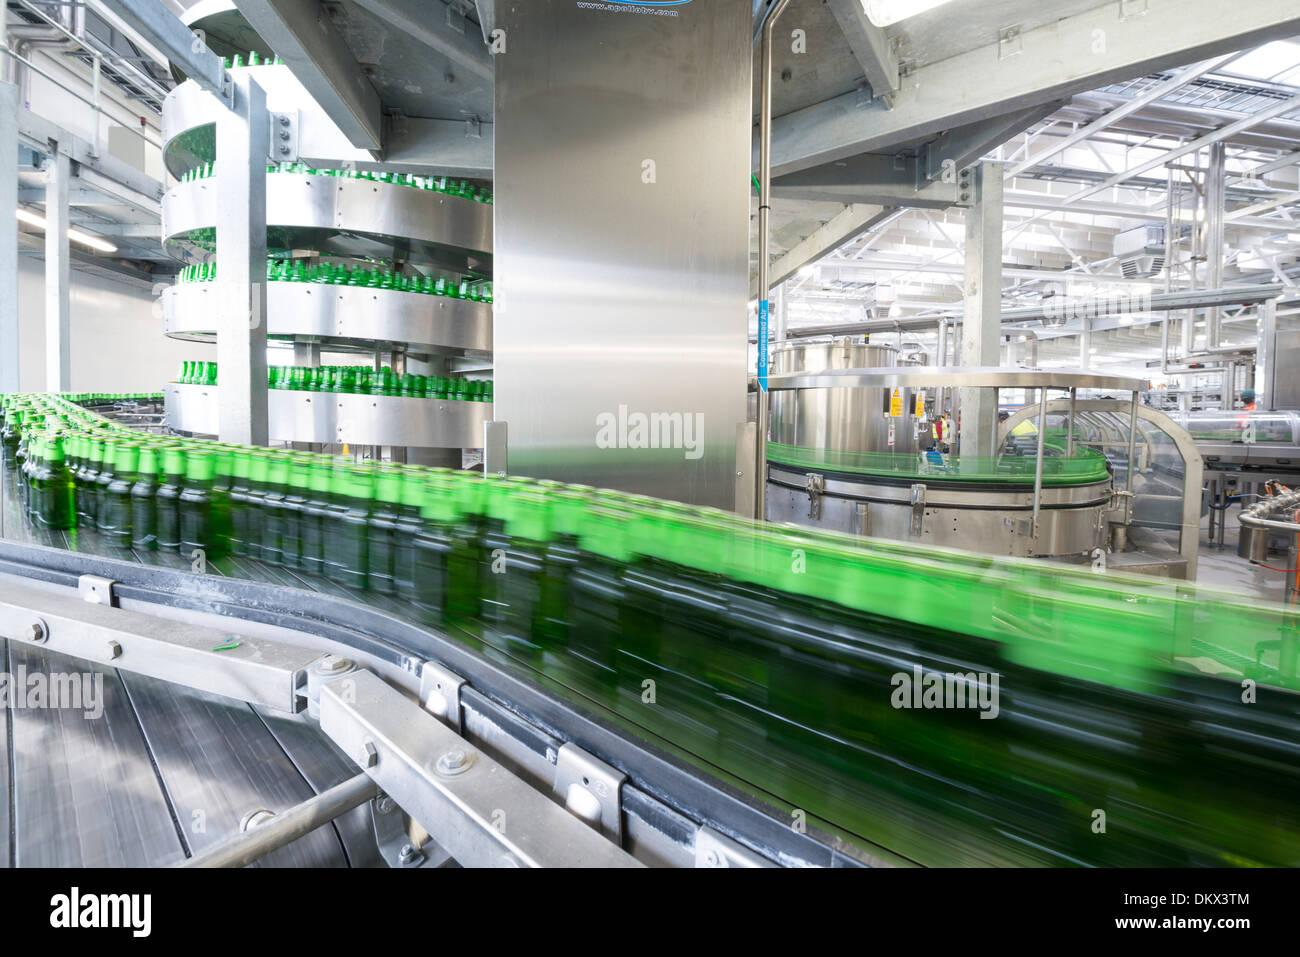 A beer bottling factory - Stock Image